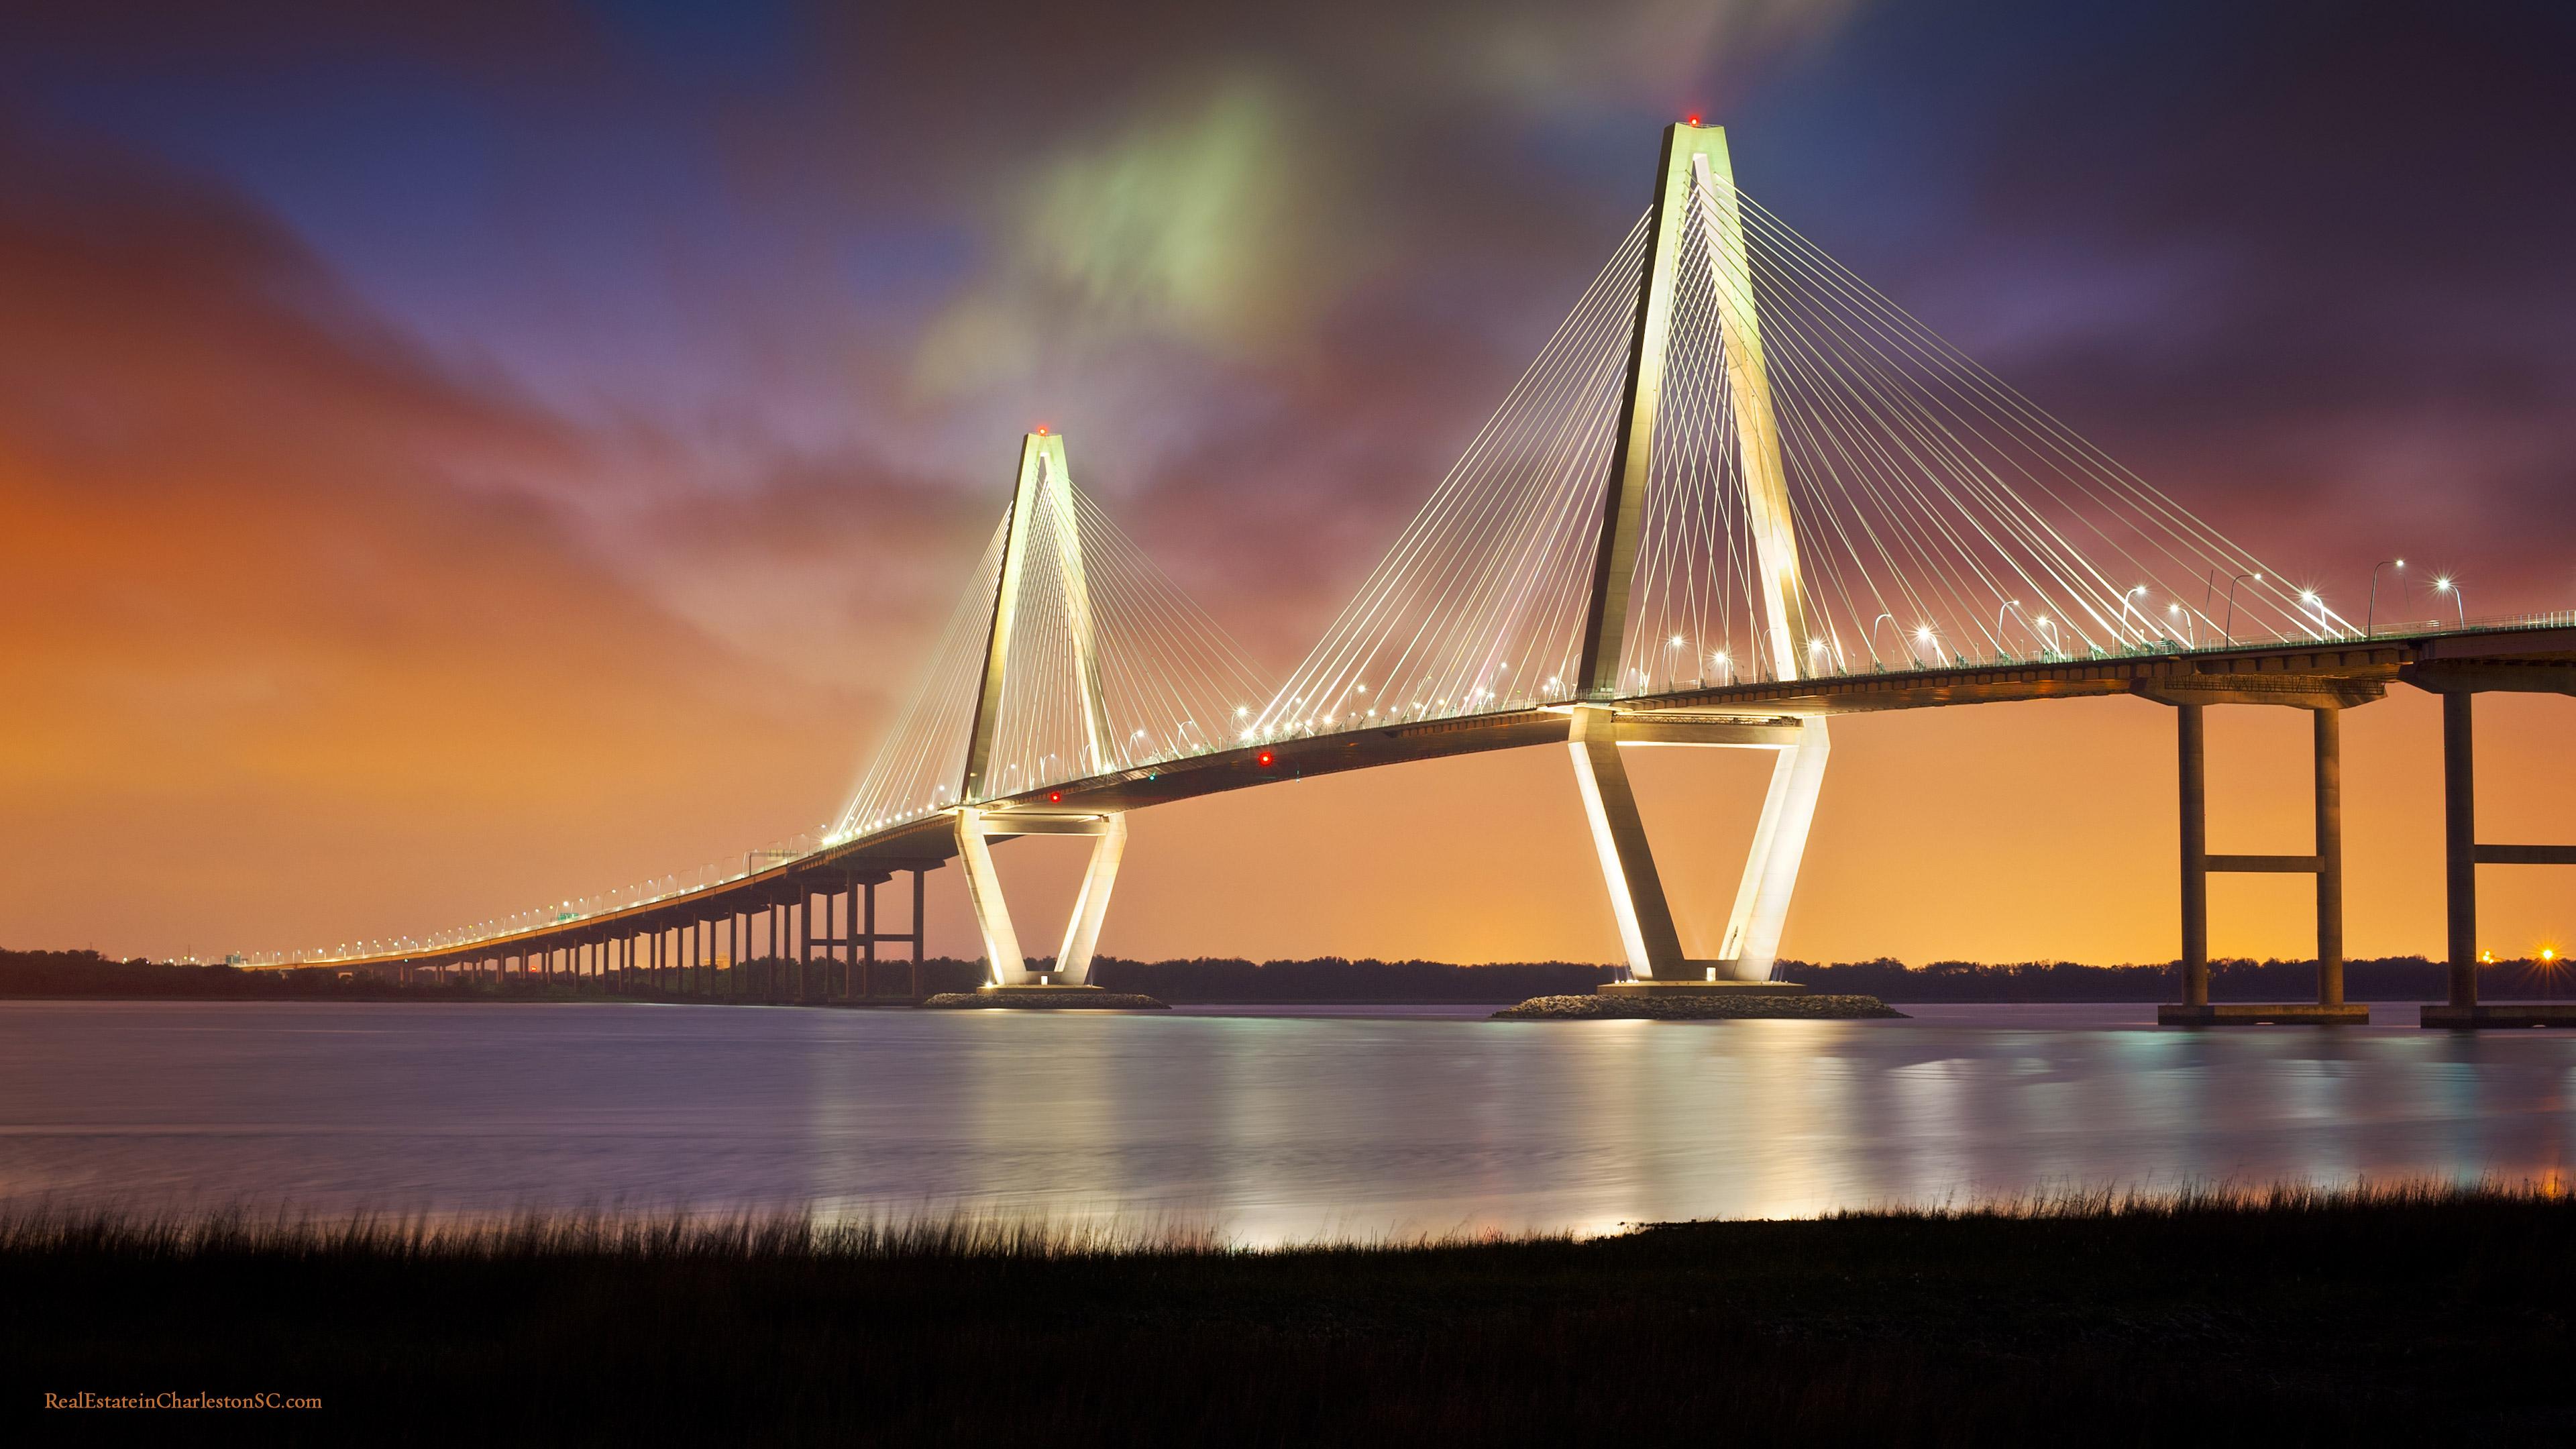 Arthur Ravenel Jr Bridge Night 3840x2160